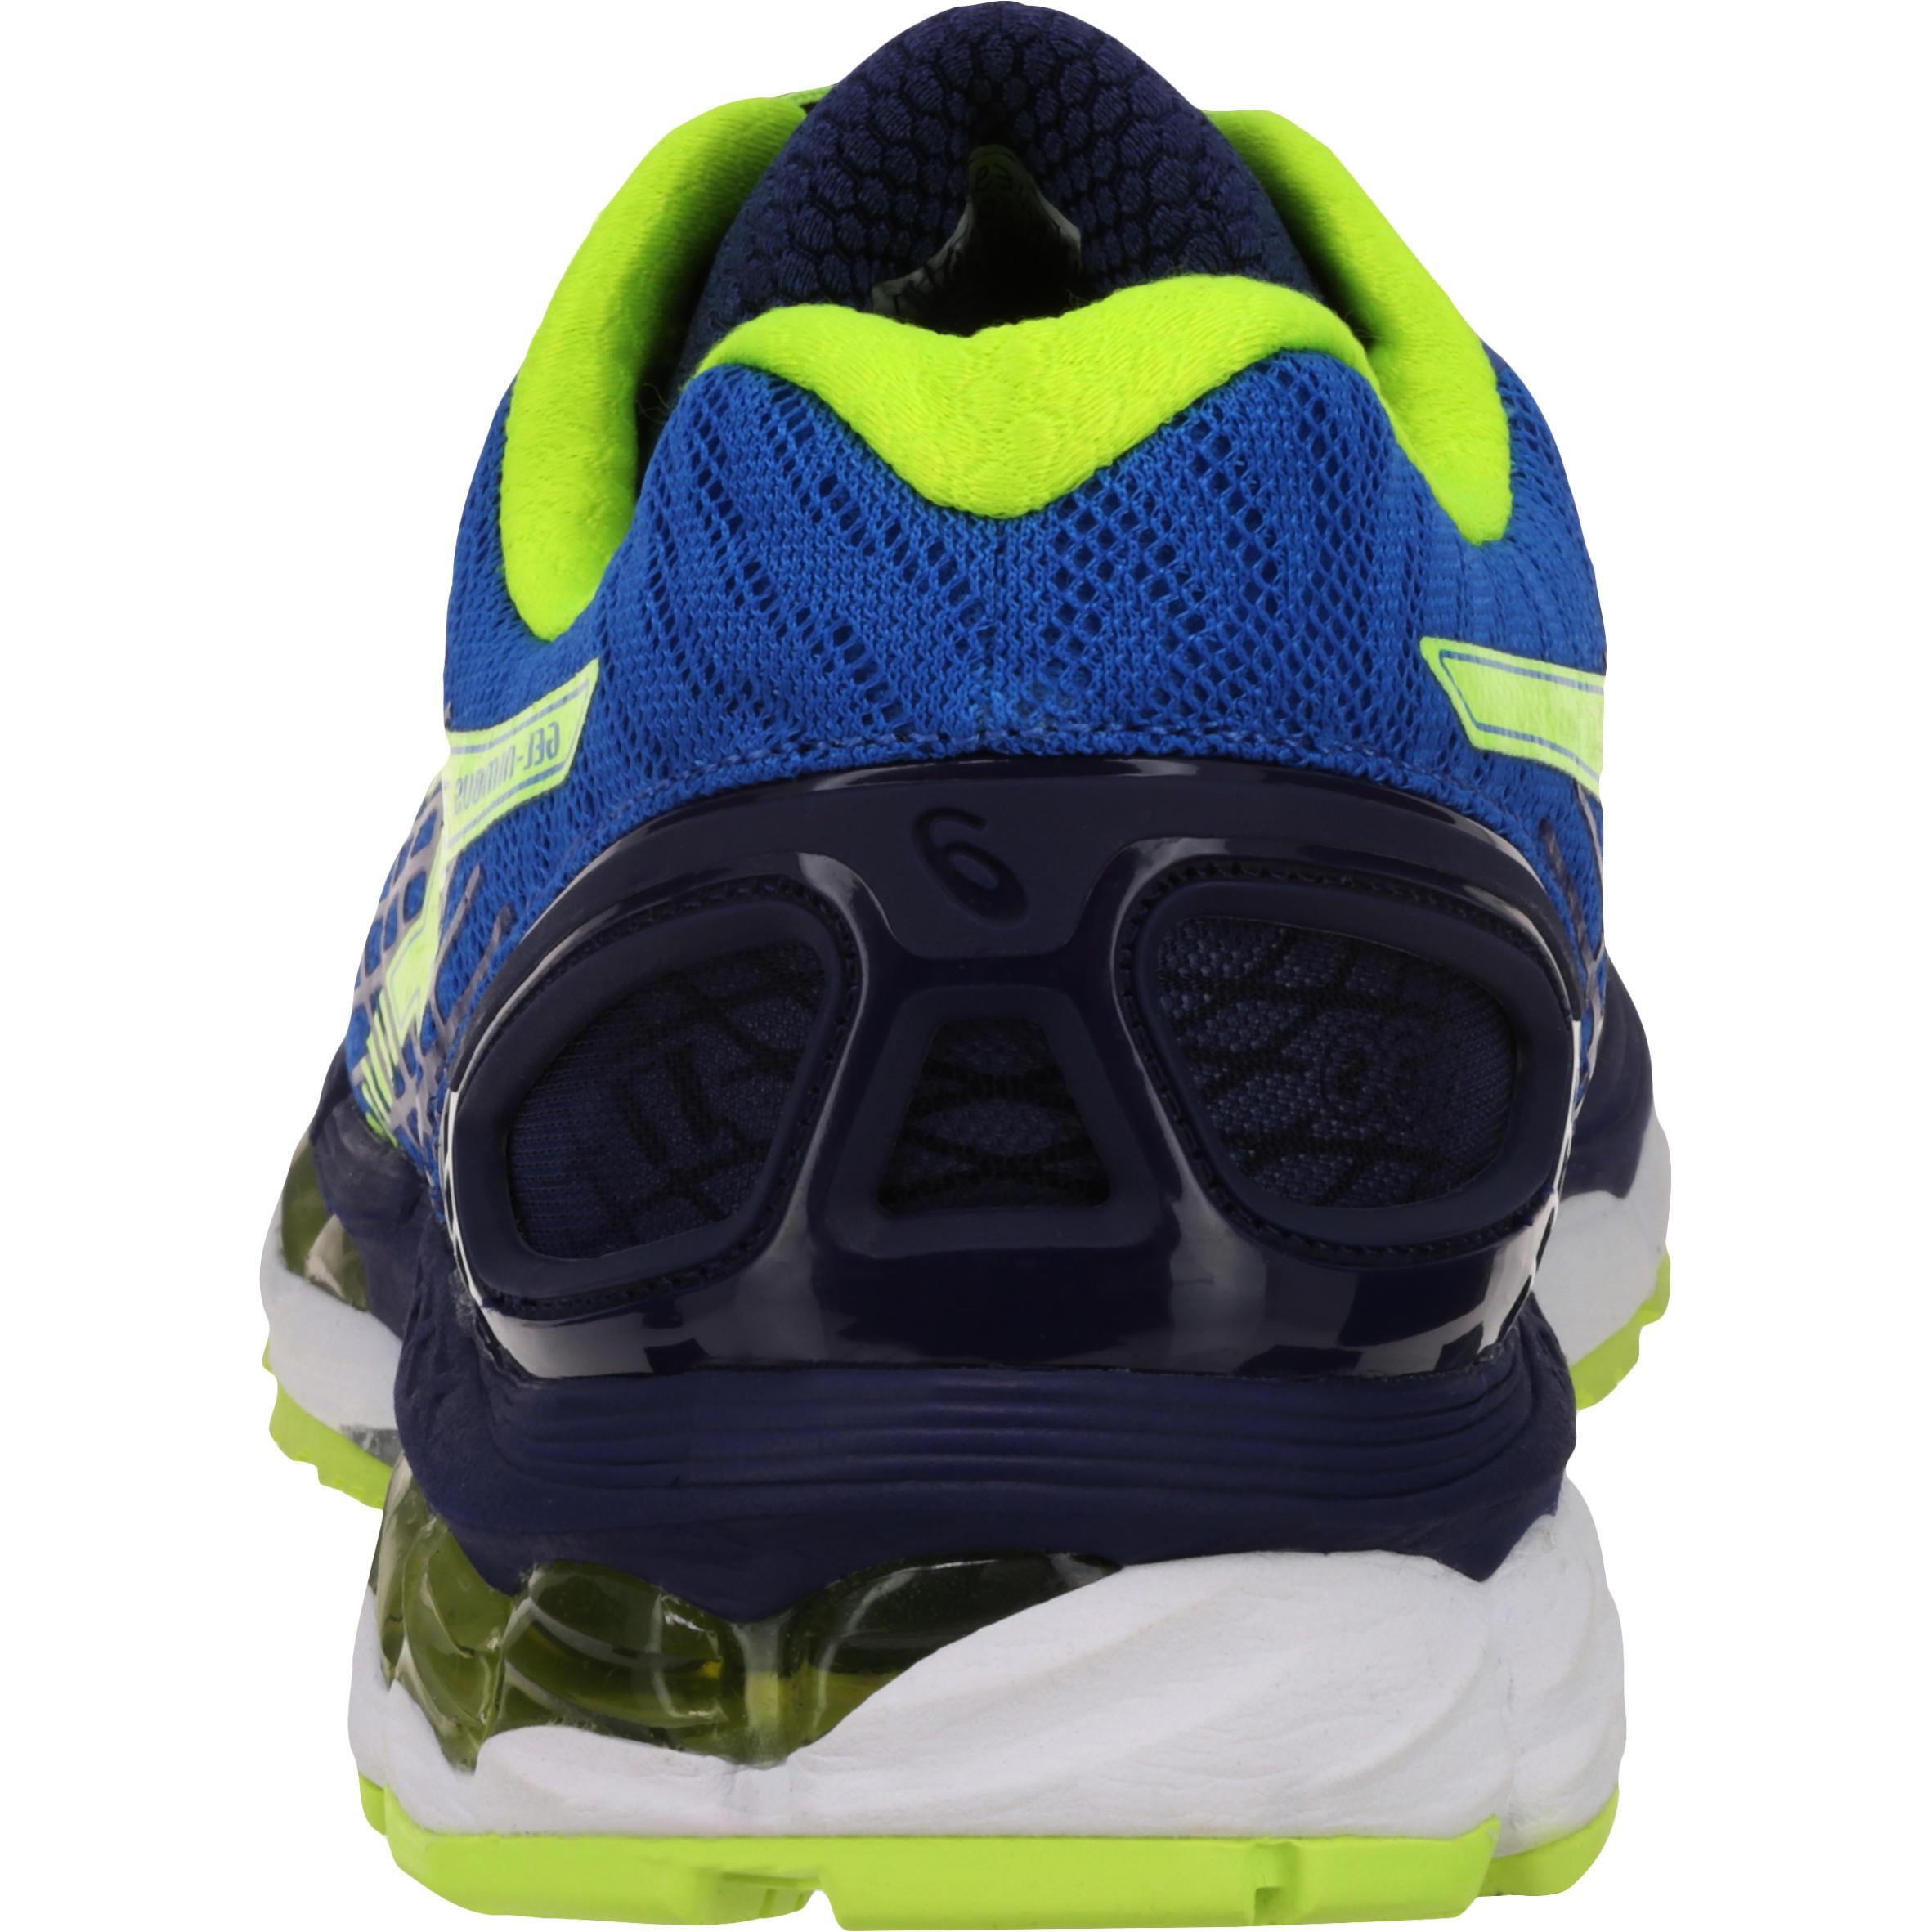 Homme Running Gel Nimbus Asics Chaussures 17 luFc1KTJ3